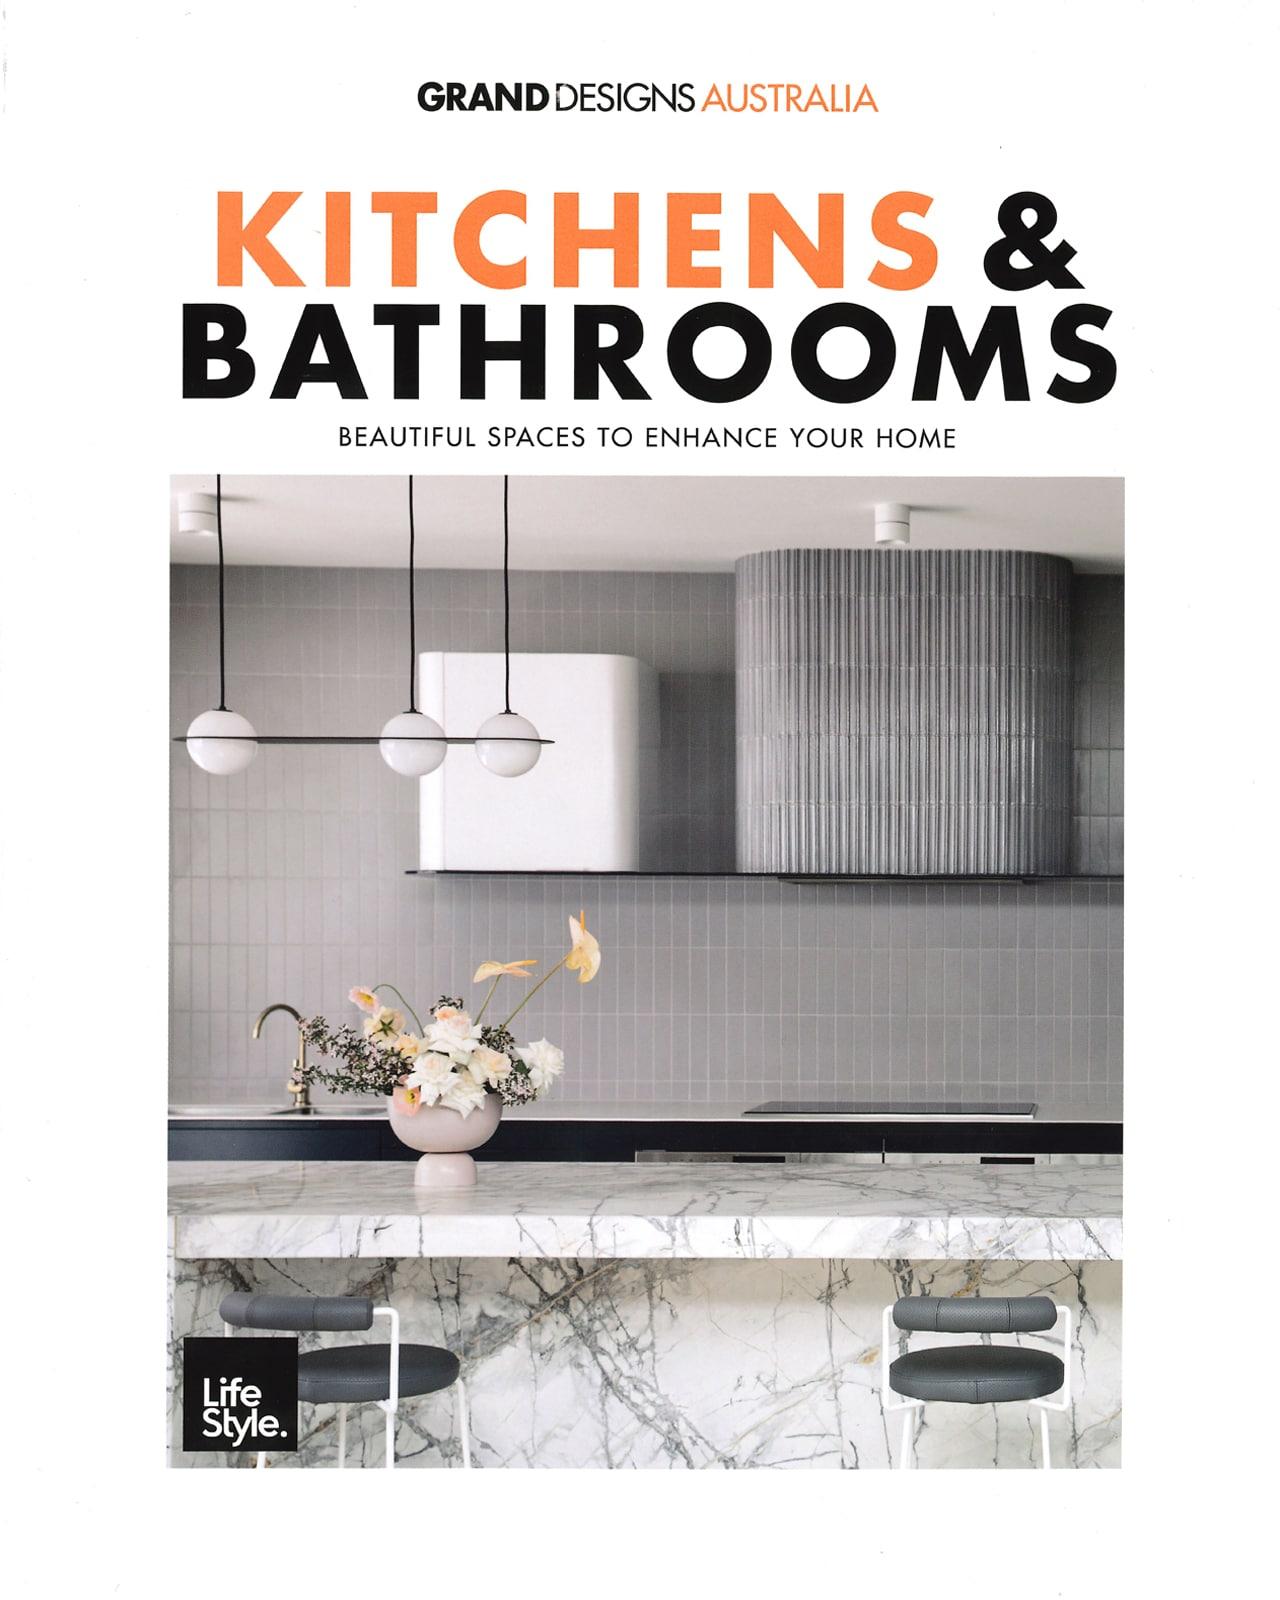 Studio Black Interiors is proudly featured in Grand Design Australia Kitchens and Bathroom Magazine April 2021